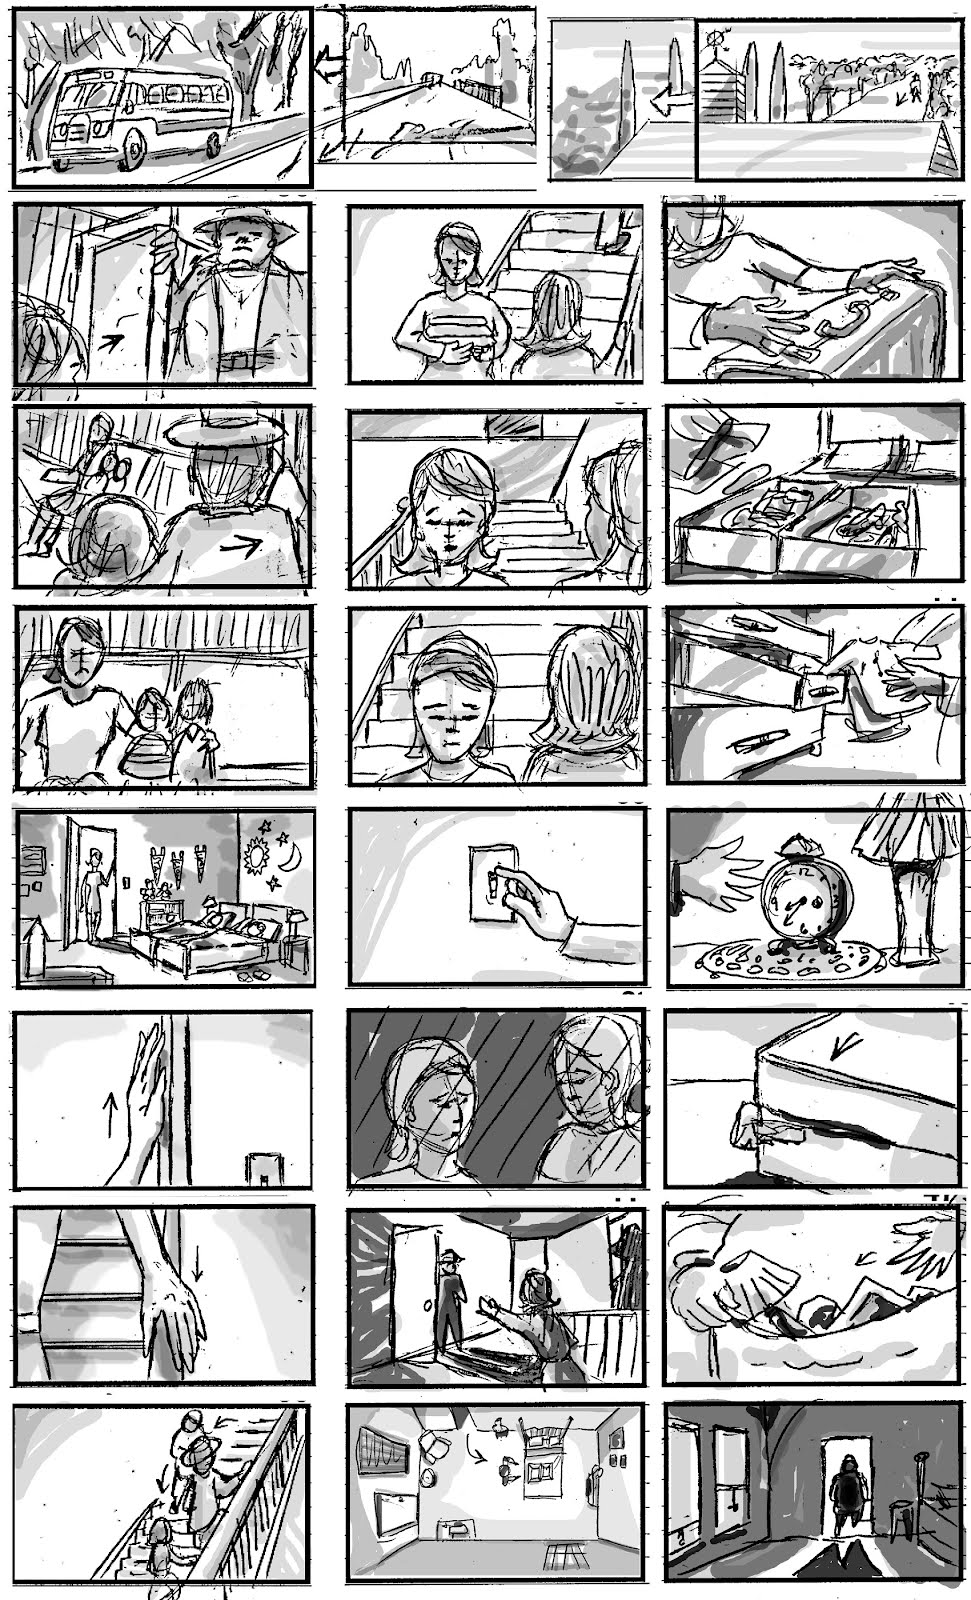 Storyboard Sample | Van Dyke S Storyboards Sketches Projects Storyboard Sample